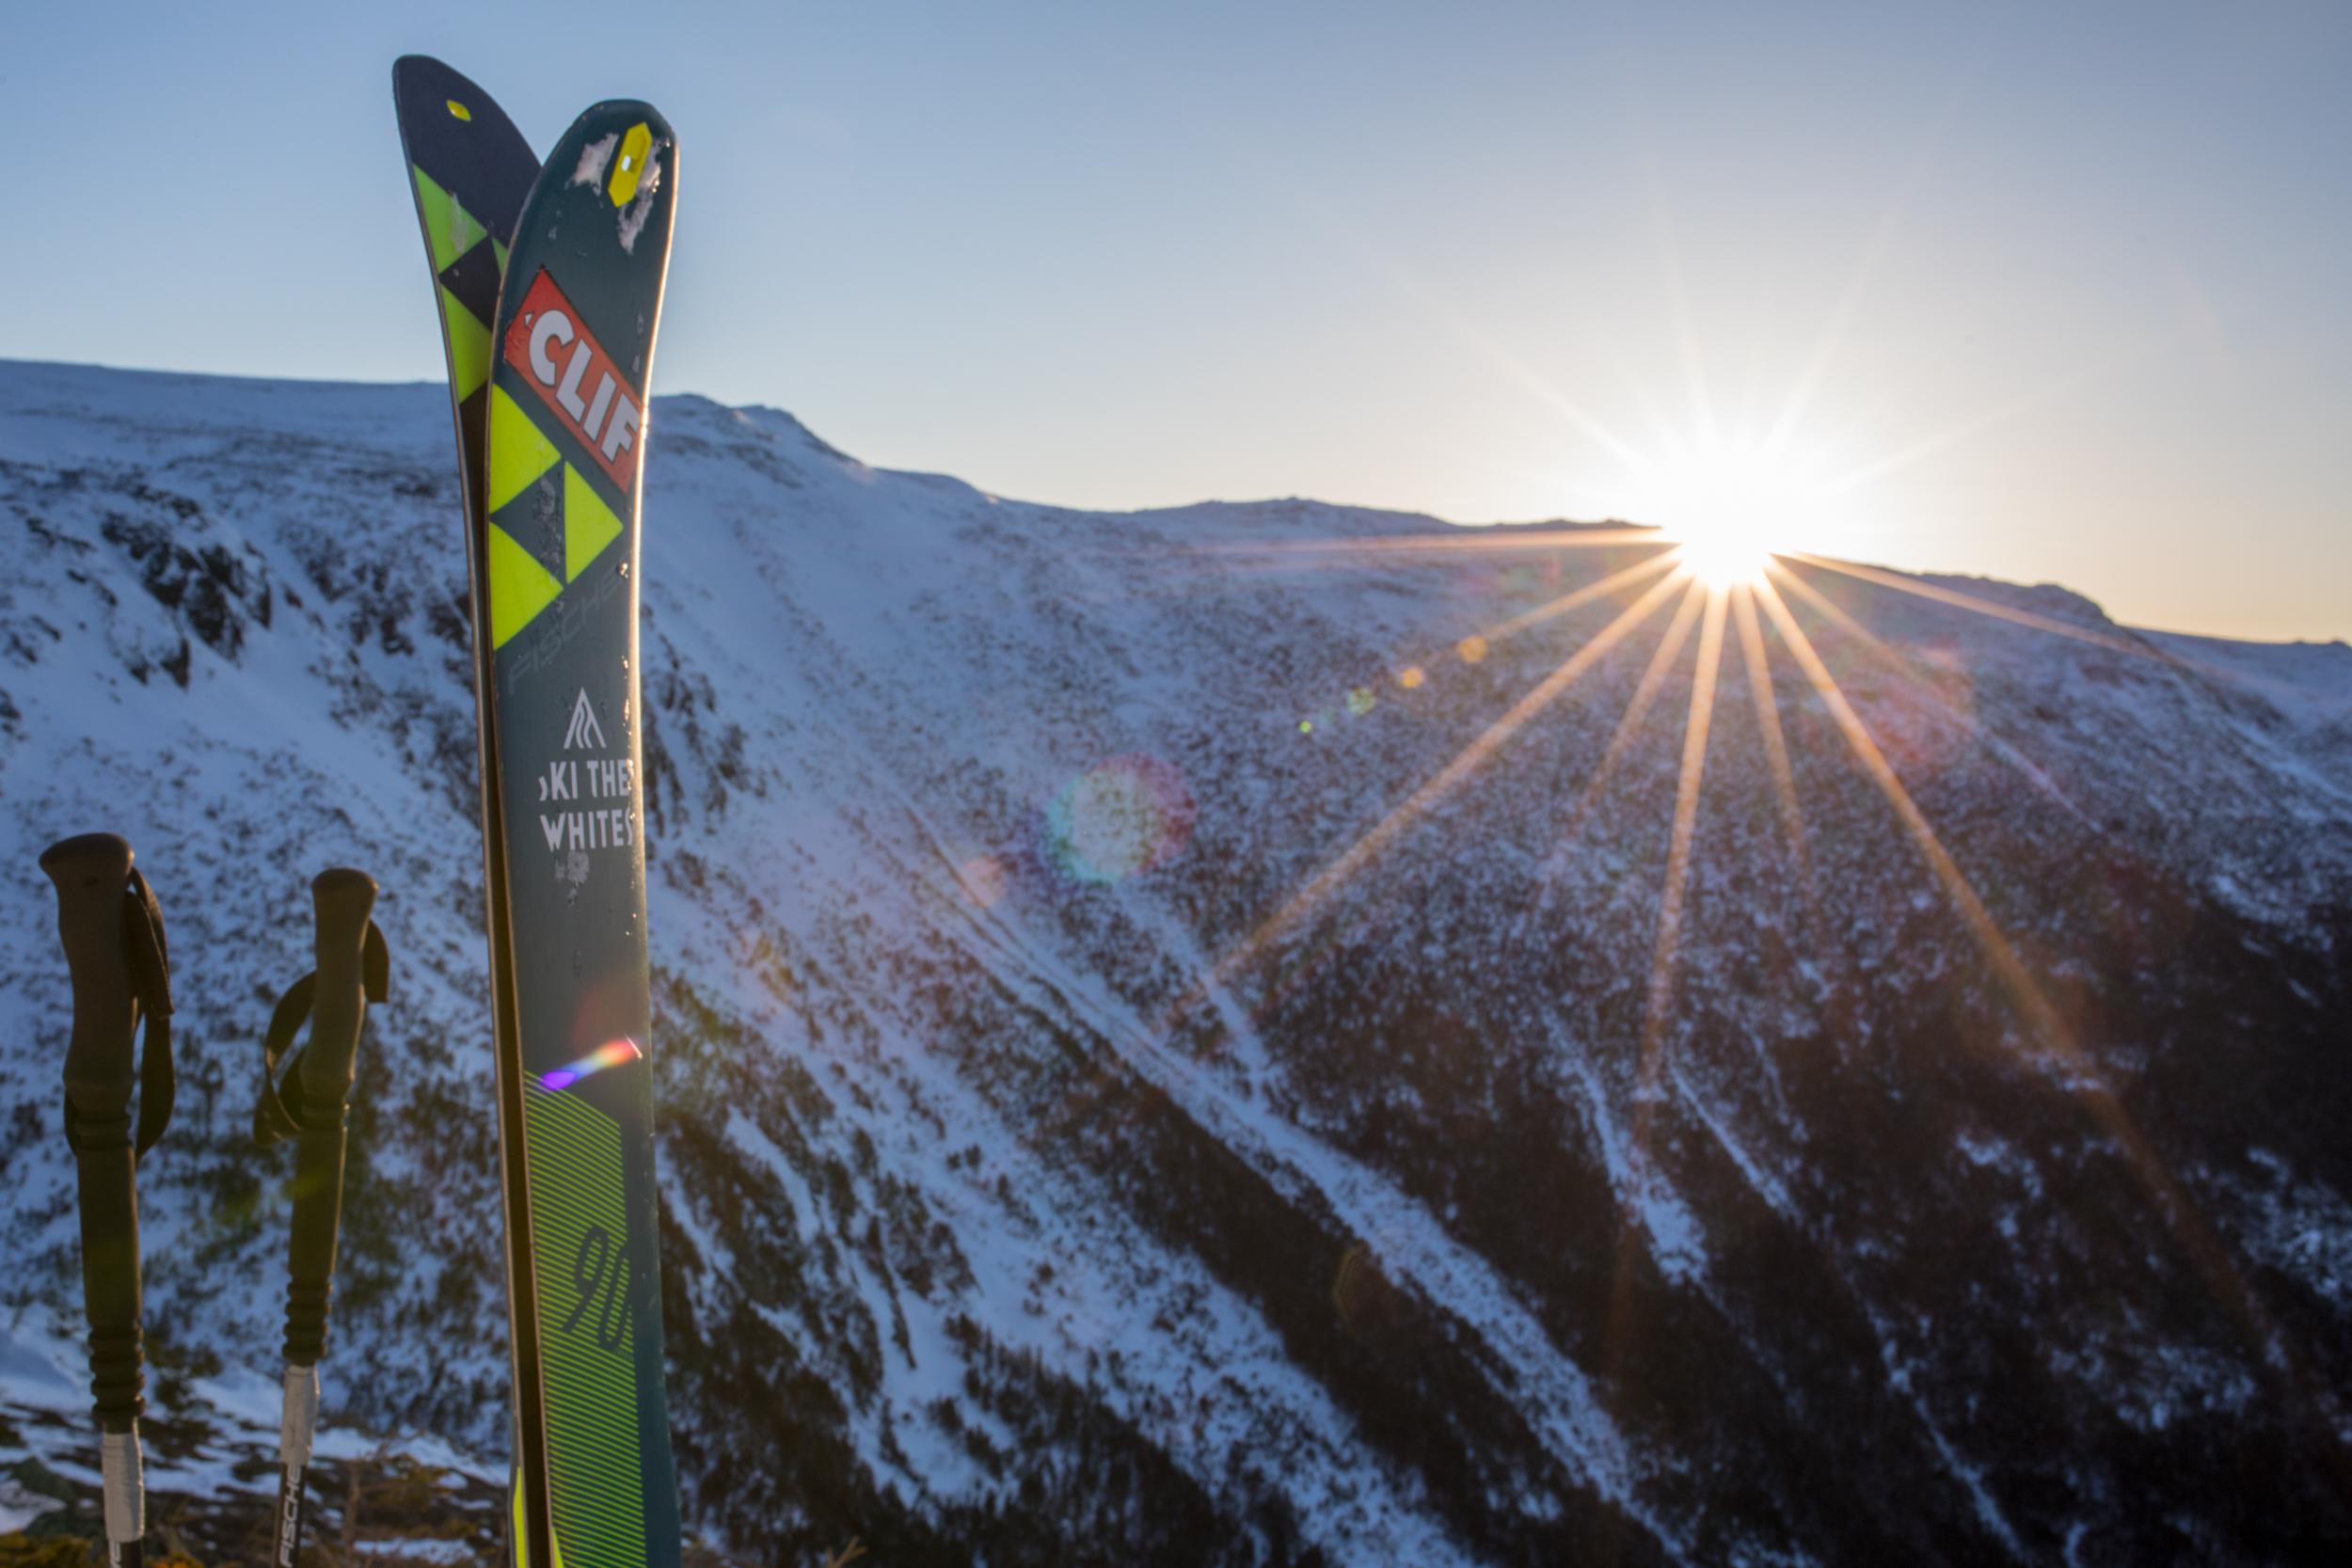 Ski The Whites - Sunrise.jpg